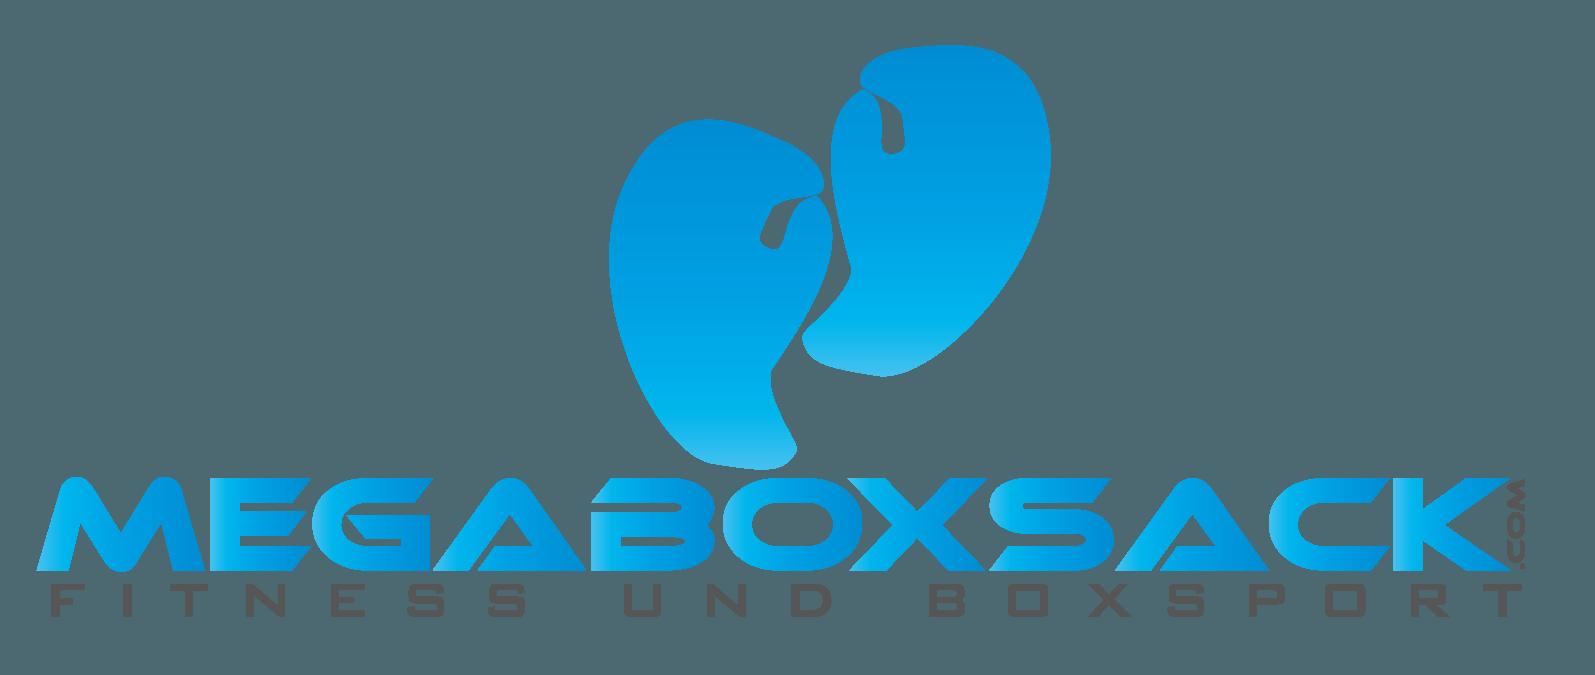 Megaboxsack Logo